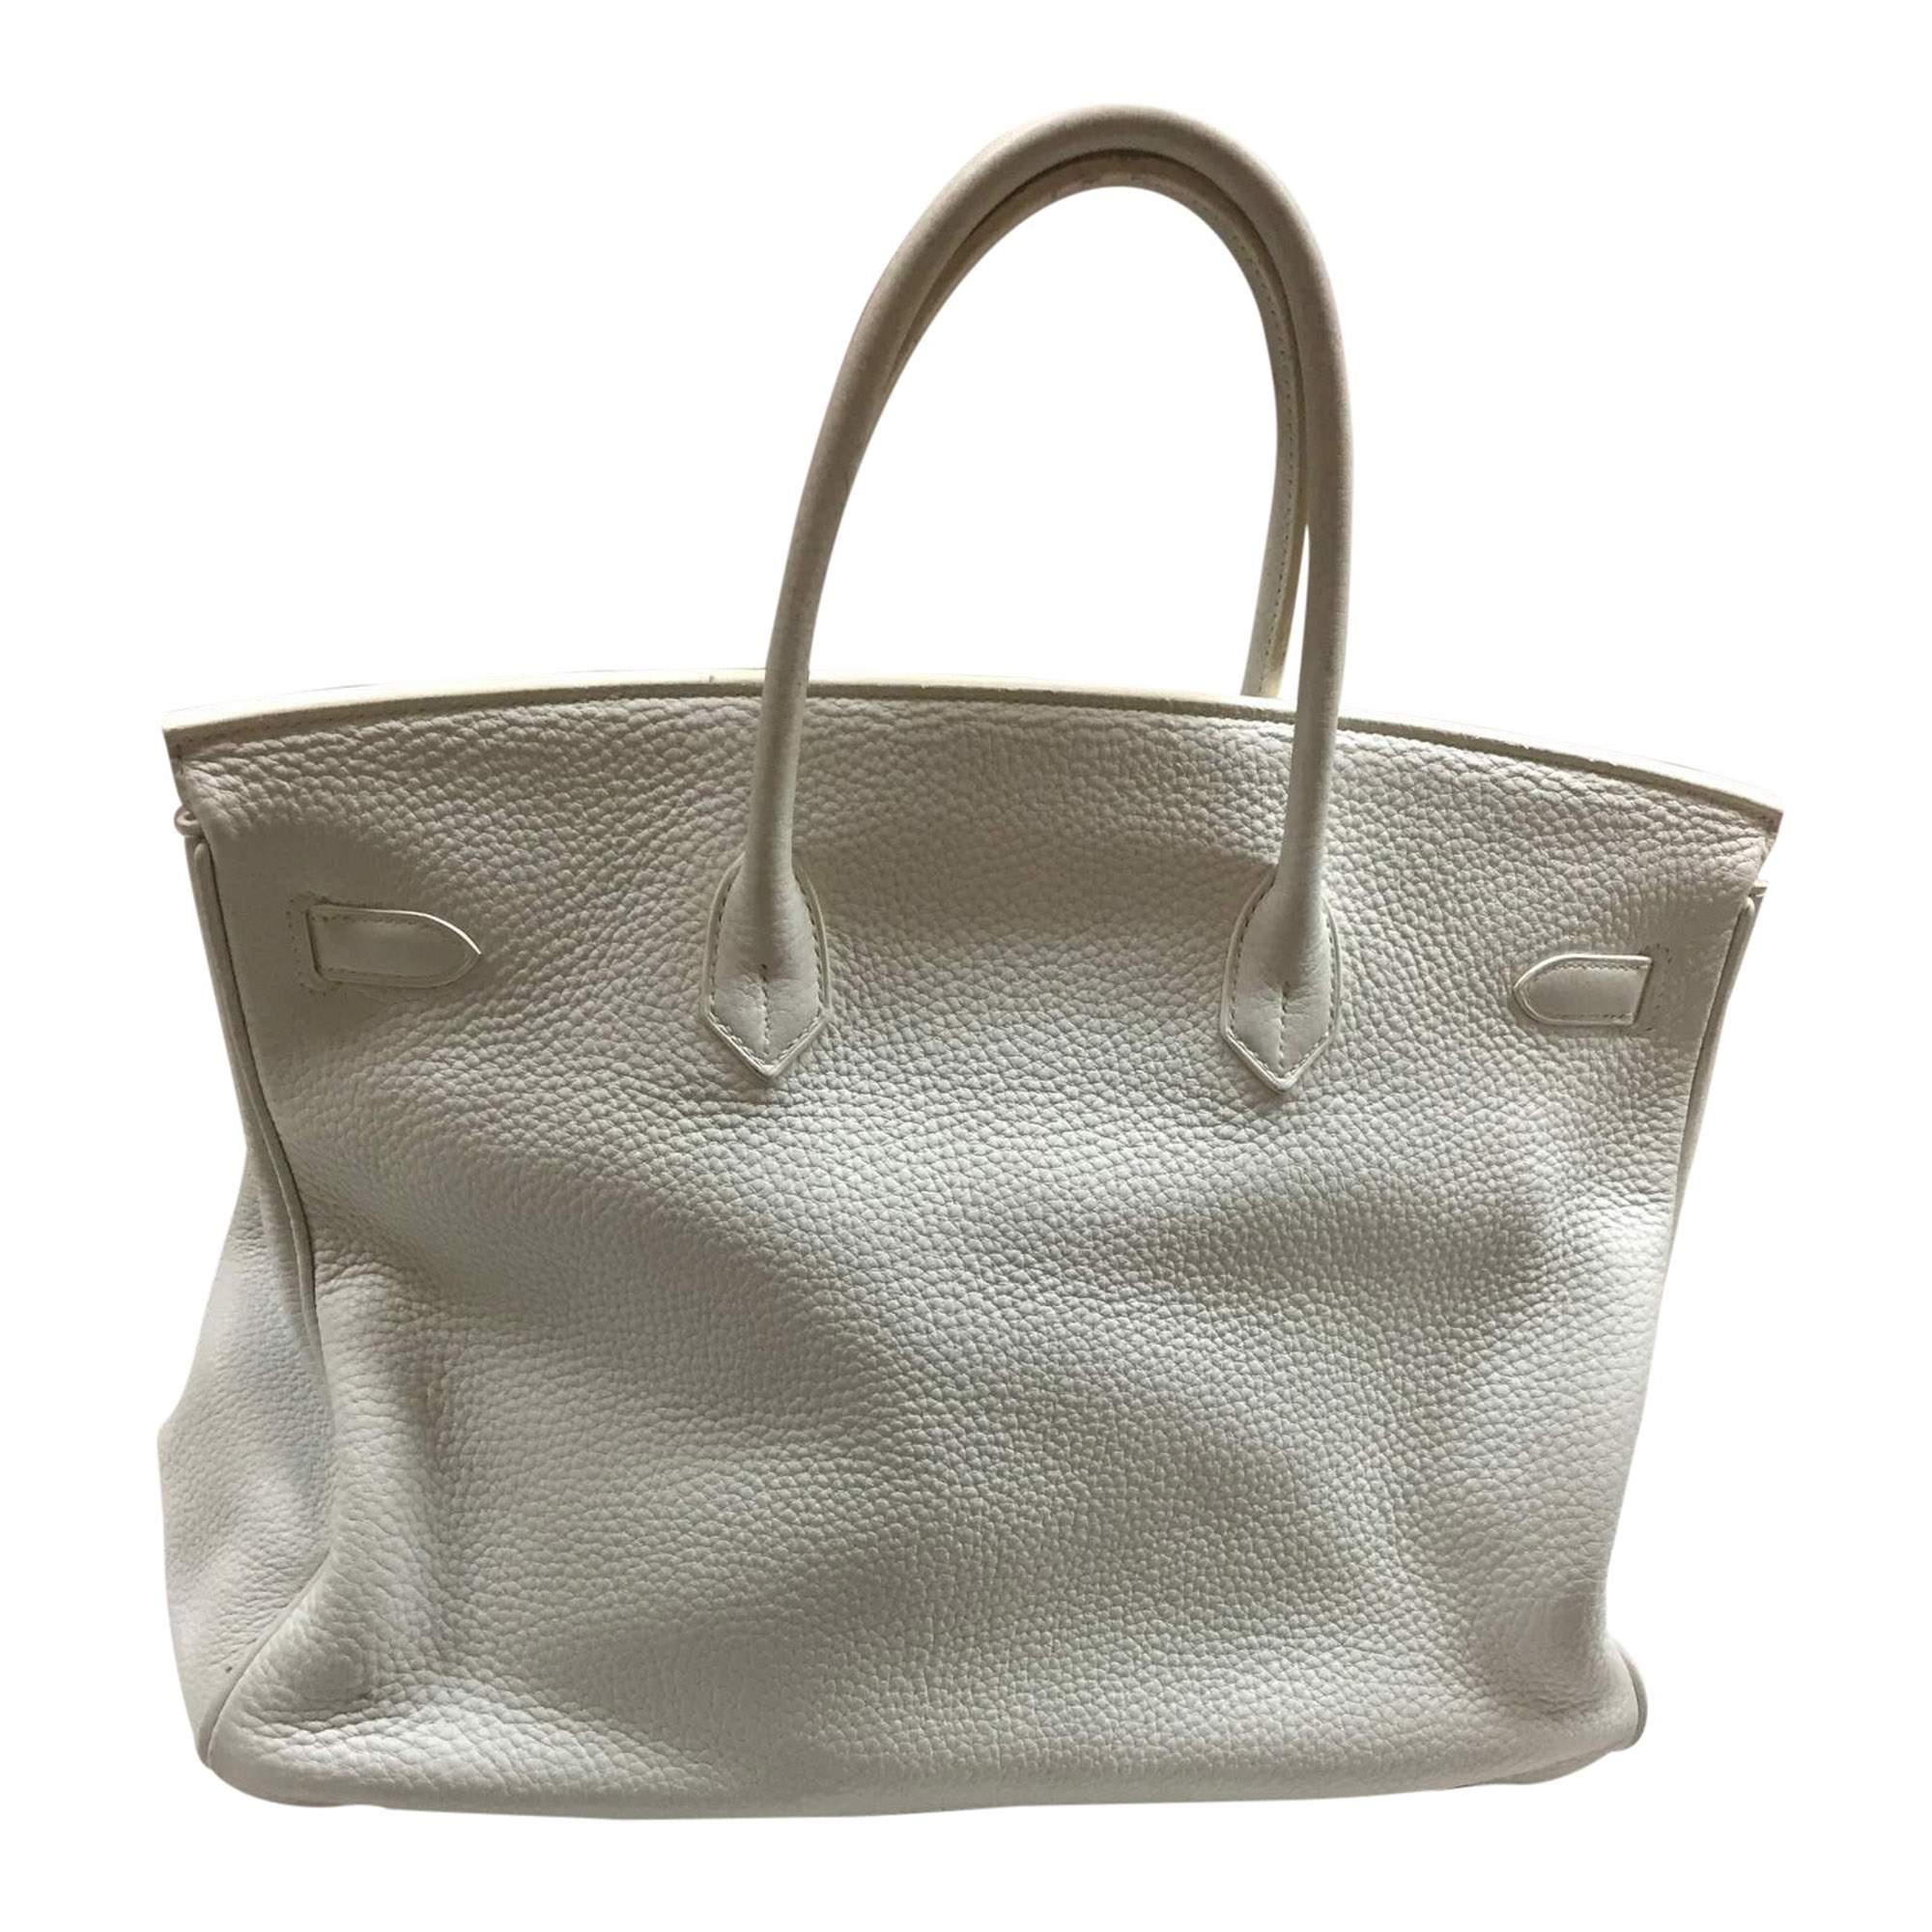 4ee0628d6c ... leather handbag dcb9b 4de69 cheap hermes white birkin 40 the chic  selection 55b55 3cd11 ...